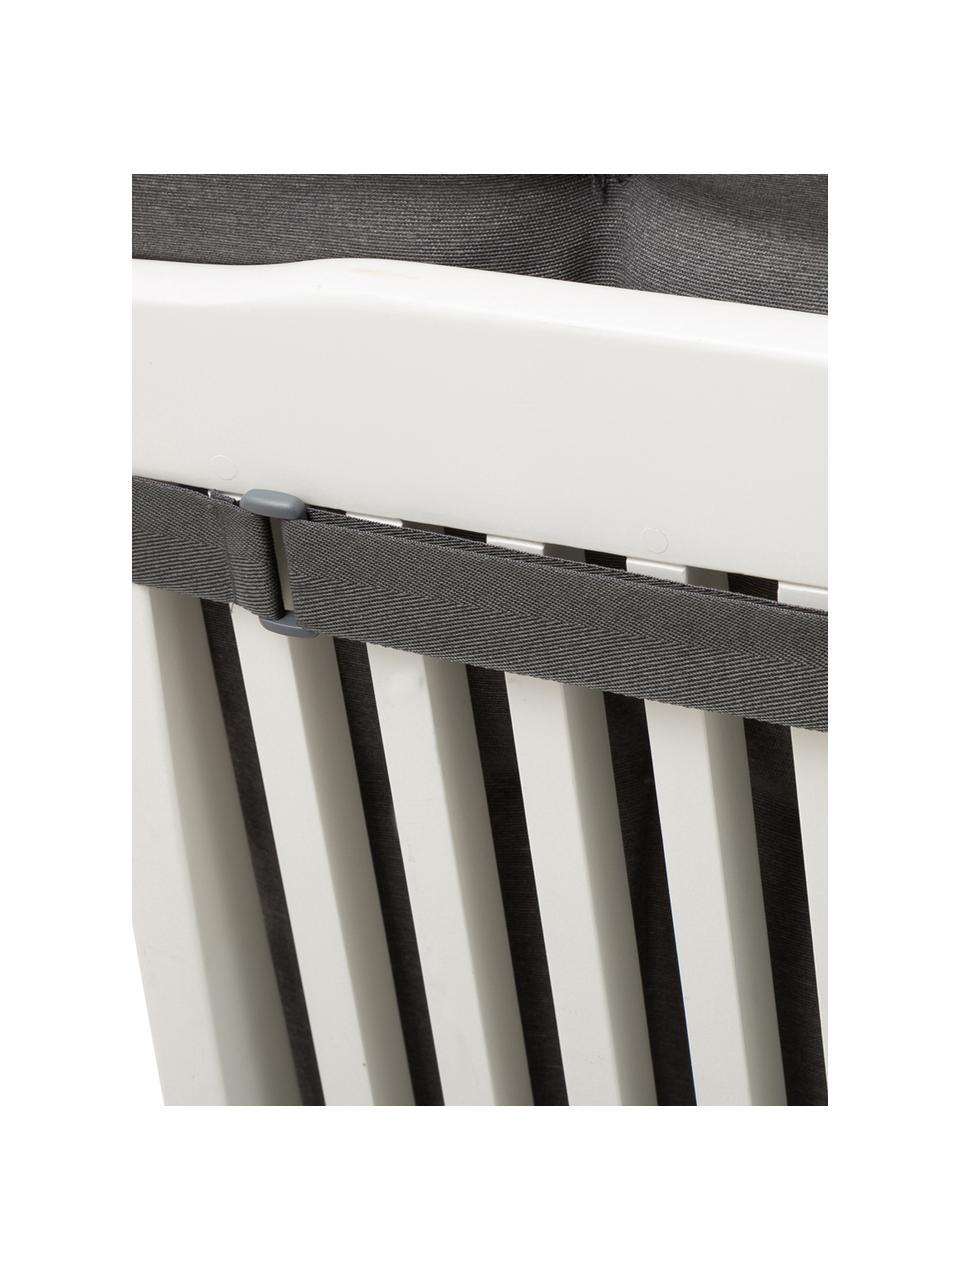 Einfarbige Hochlehner-Stuhlauflage Panama in Anthrazit, Bezug: 50% Baumwolle, 50%Polyes, Grau, 50 x 123 cm